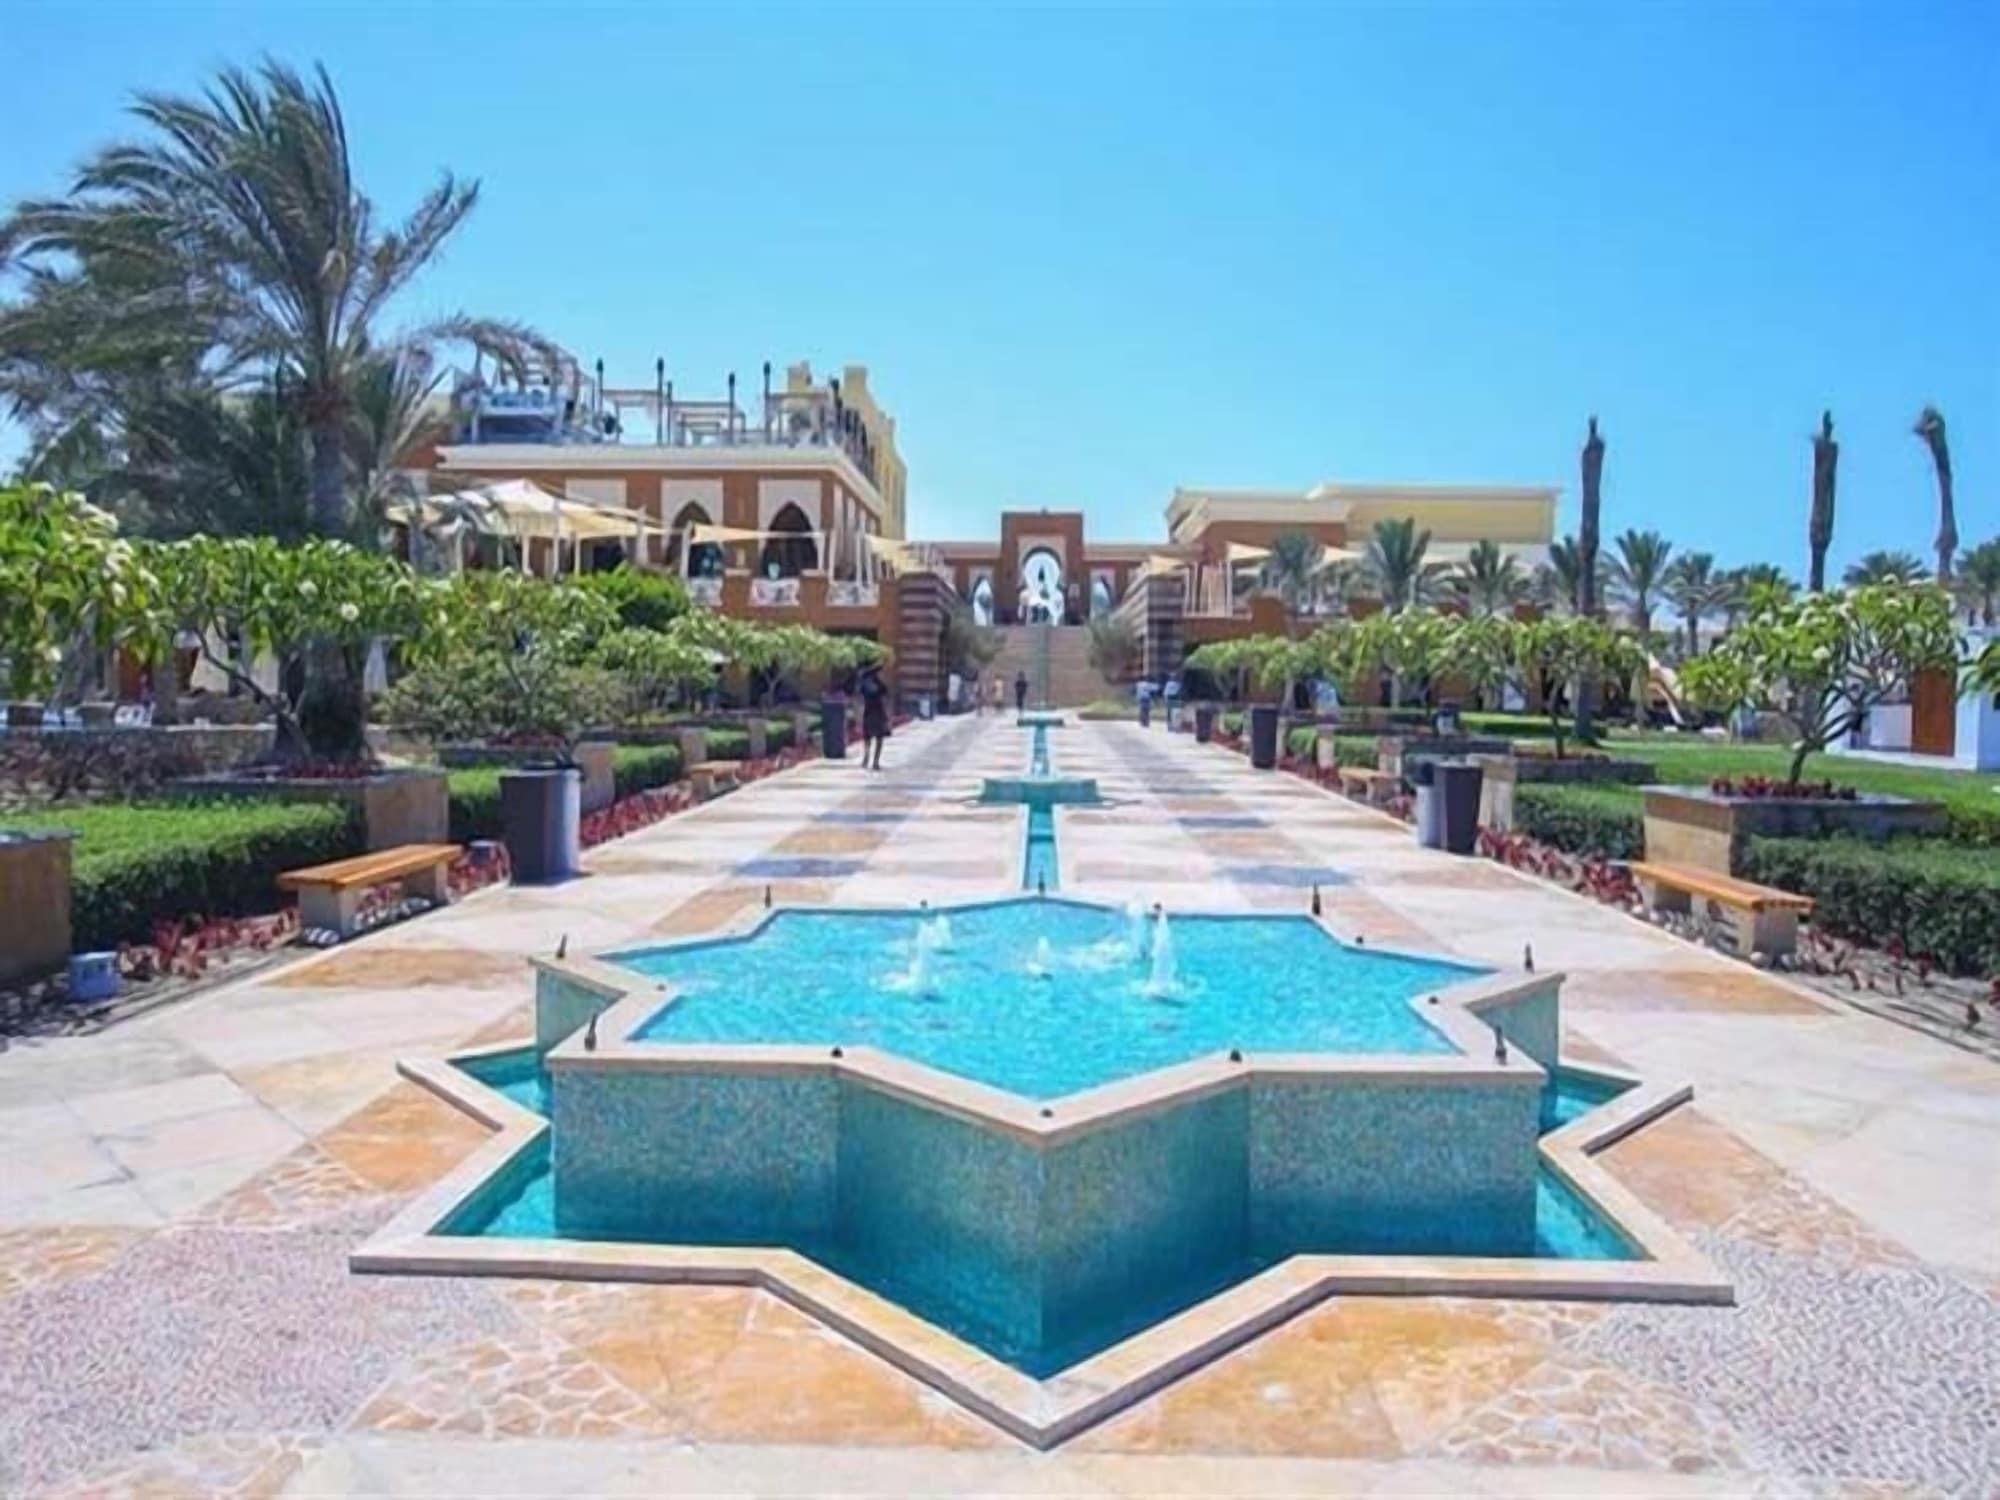 Marassi North Coast Villa V23 with pool, Marina al-'Alamayn as-Siyahiyah